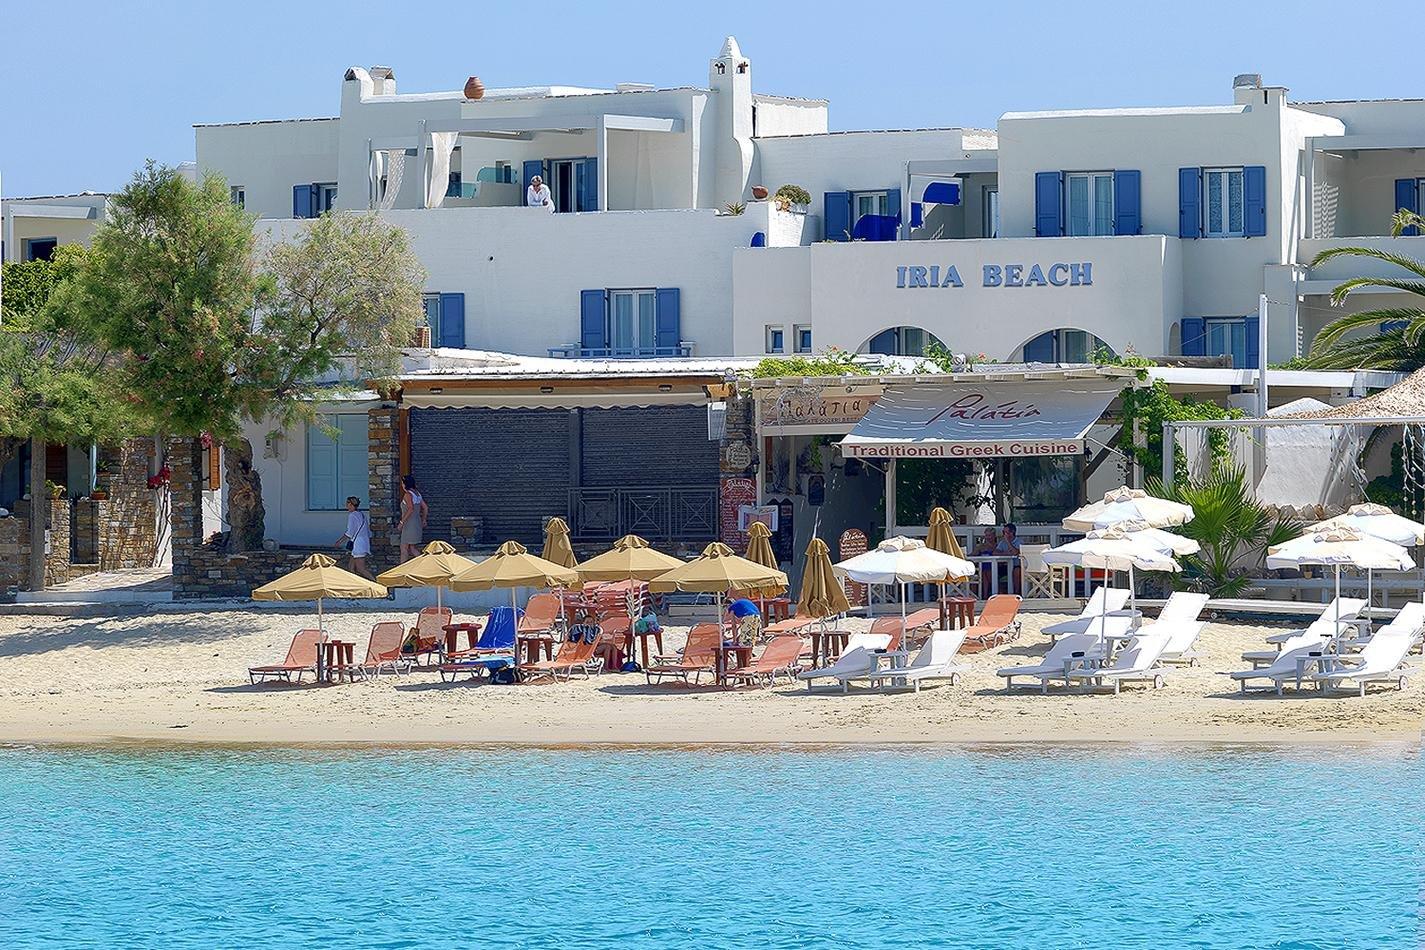 Hotel Iria Beach - strand